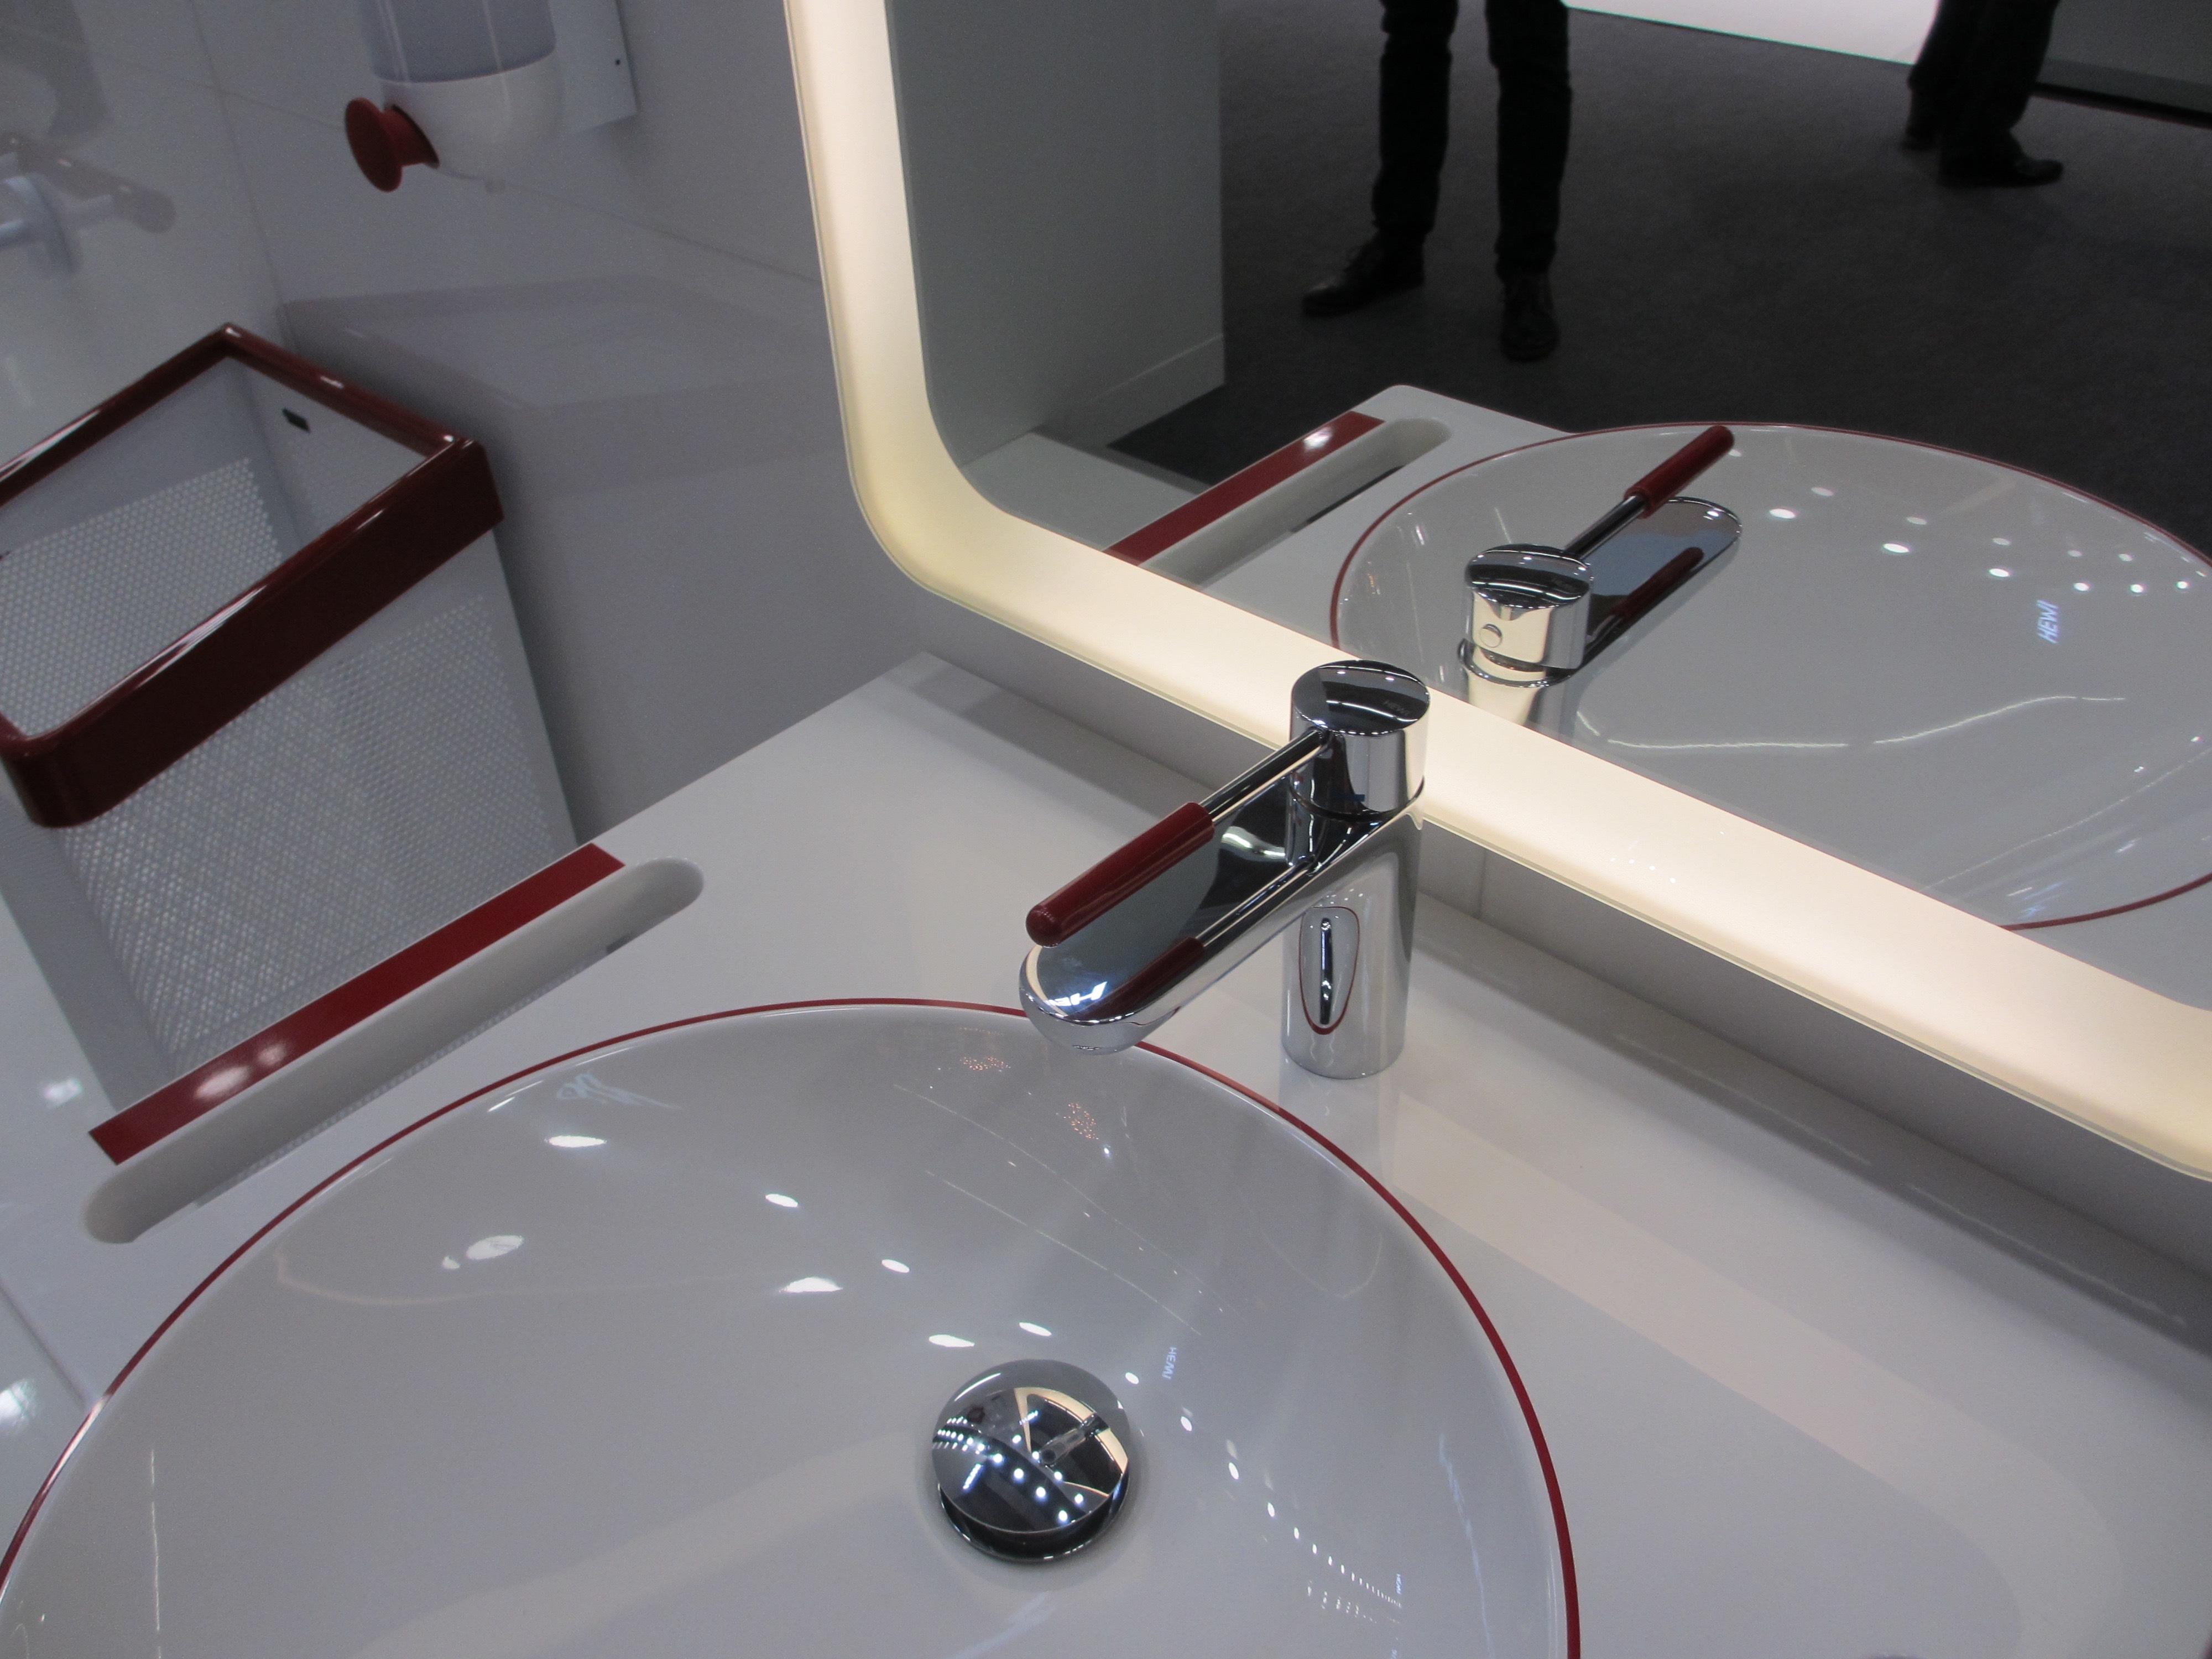 axor glass post hansa blog this design en starck transparent water faucets is v hansgrohe